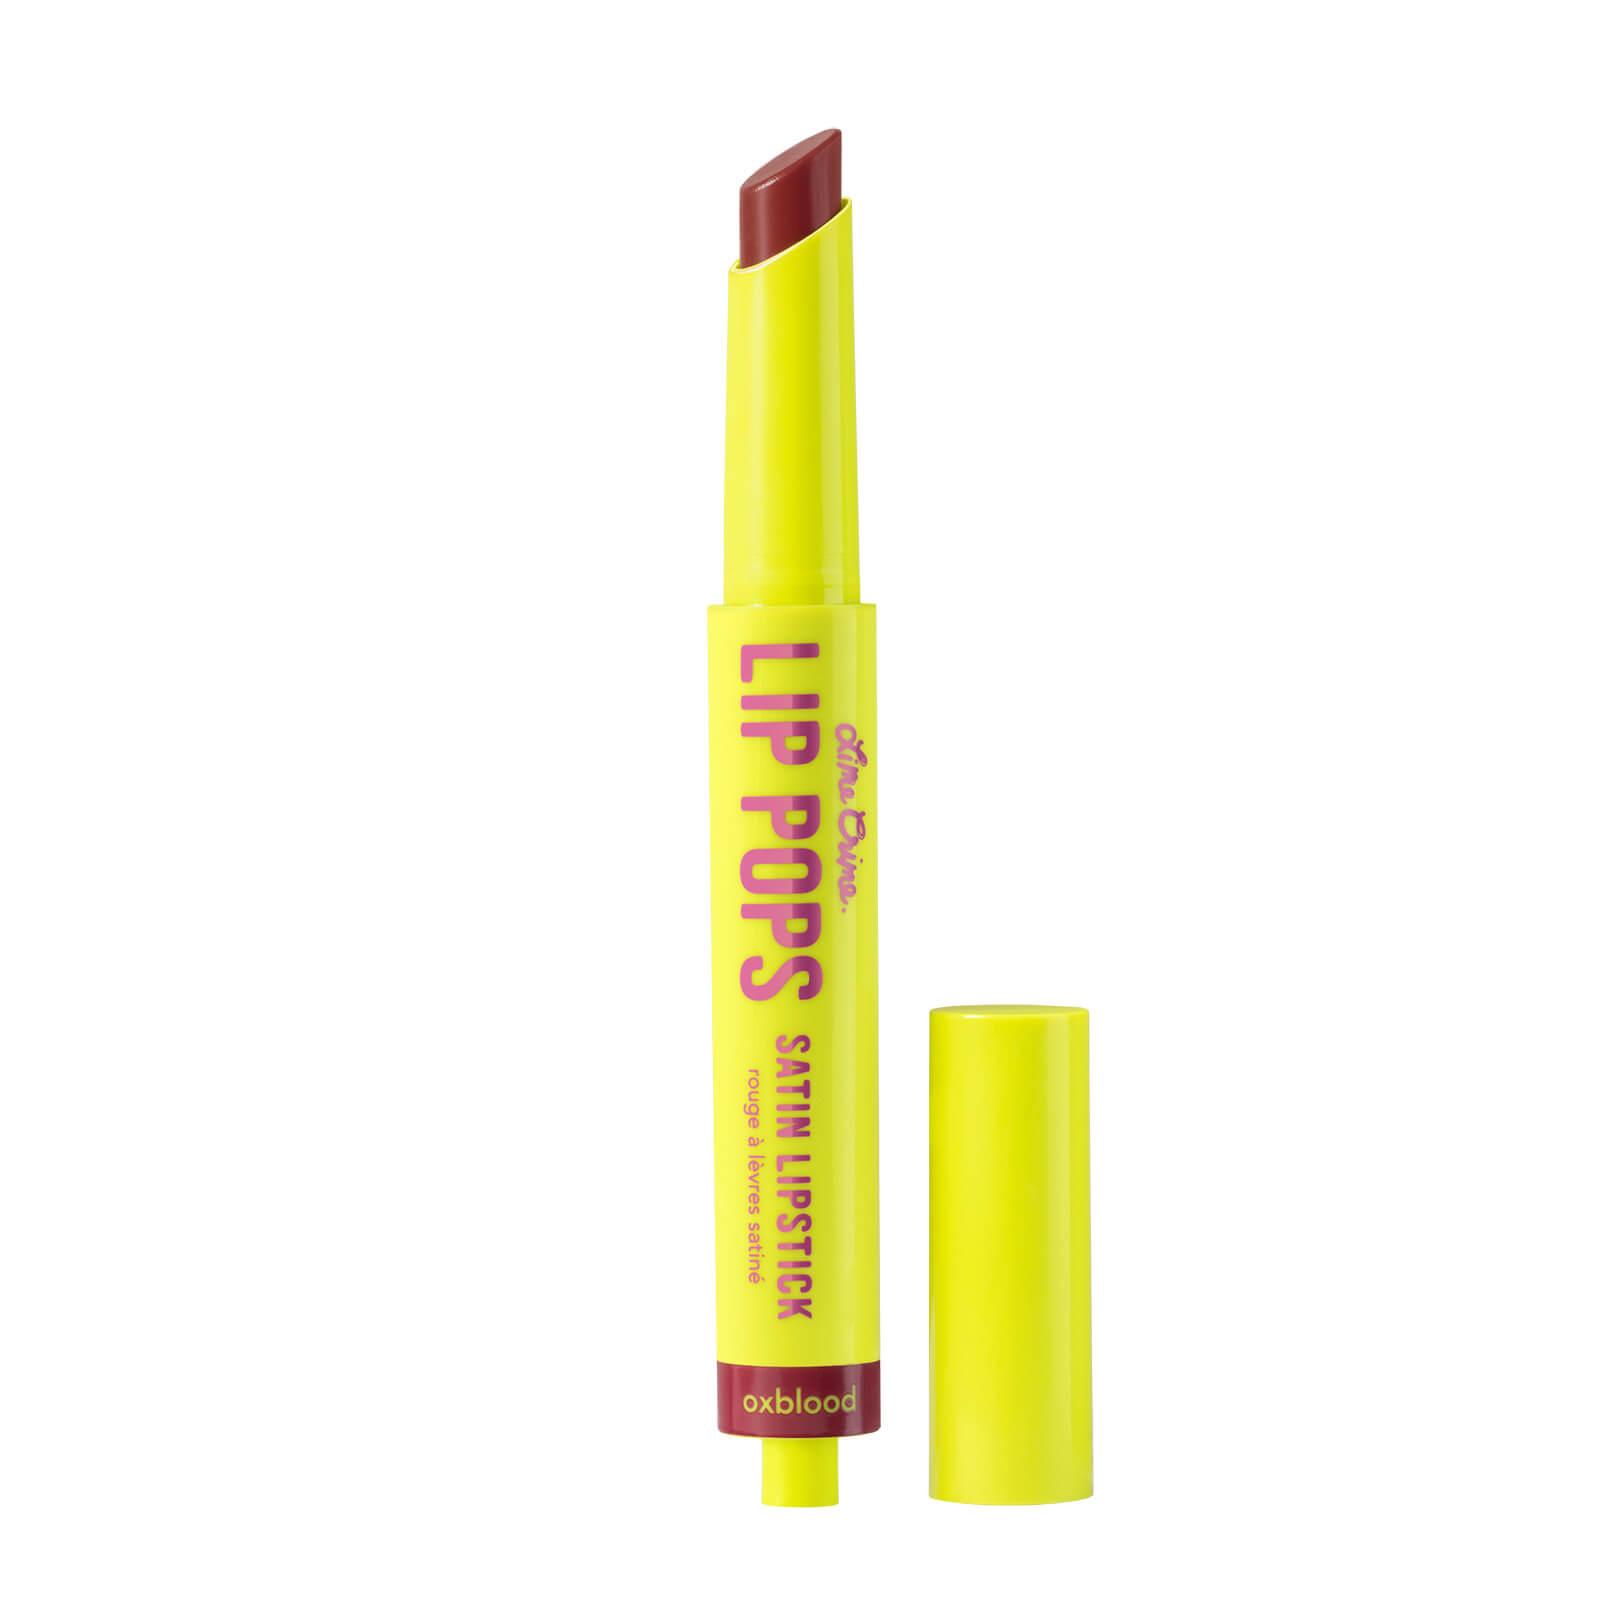 Купить Lime Crime Lip Pops 2g (Various Shades) - Oxblood